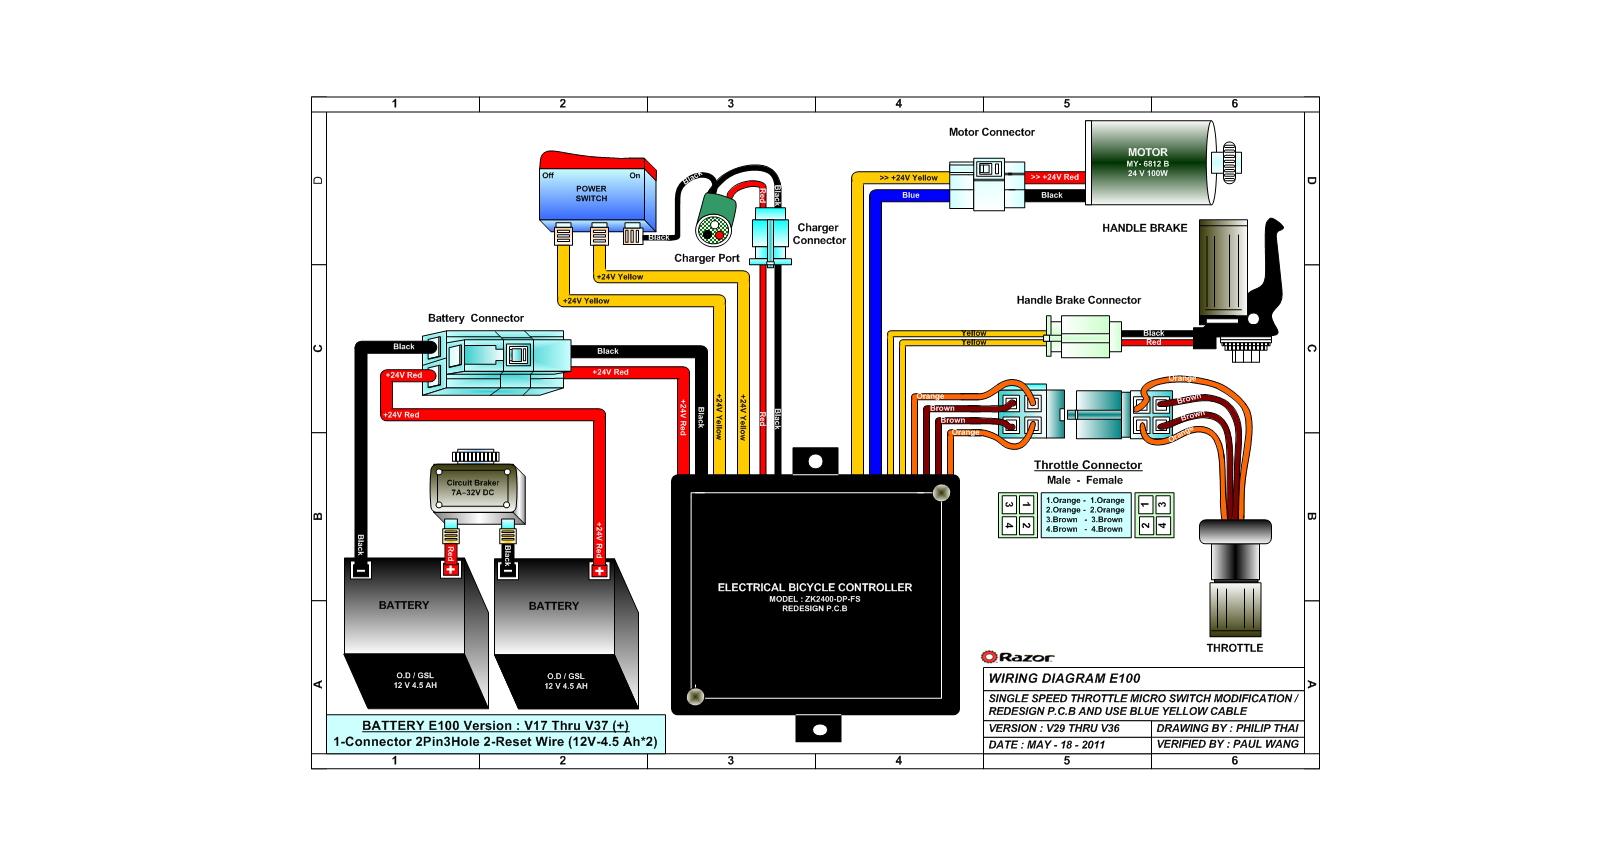 e100 v29 v36 wiring diagram?resize\\=665%2C359 100 [ gmc t6500 repair manual ] chevrolet box van truck for 2004 gmc t6500 wiring diagram at creativeand.co